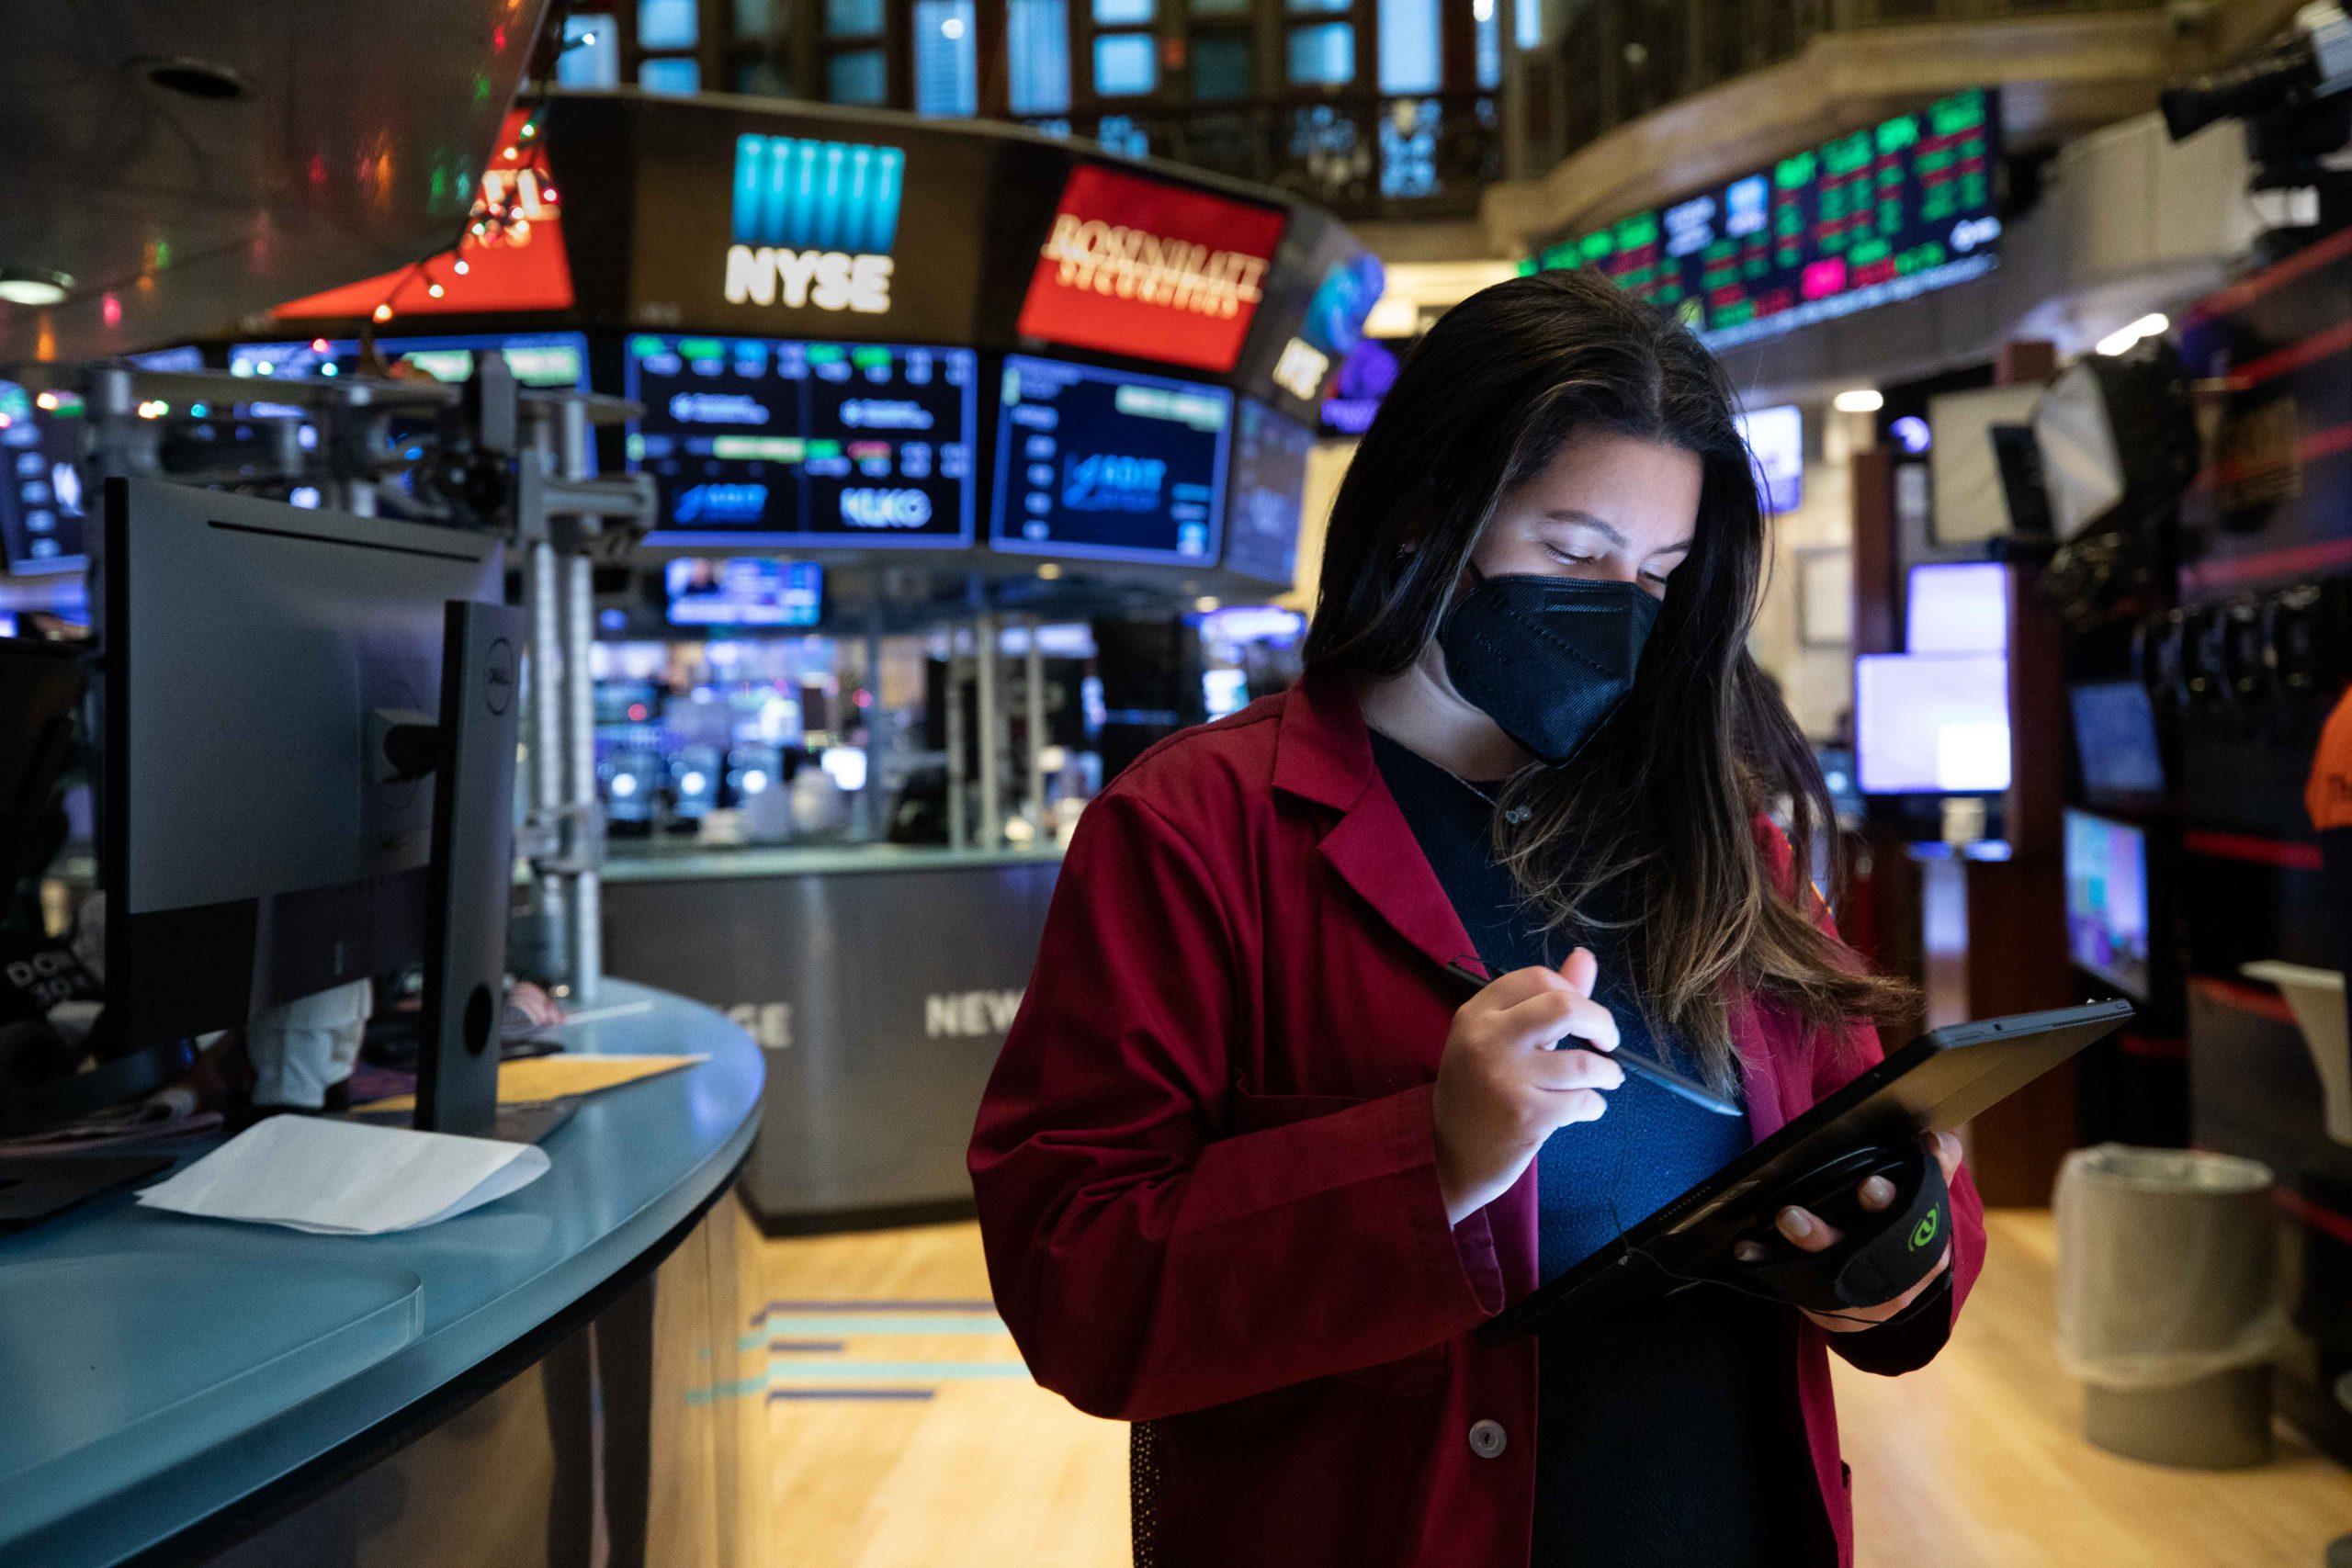 10-year Treasury yield holds steady around 1.63%